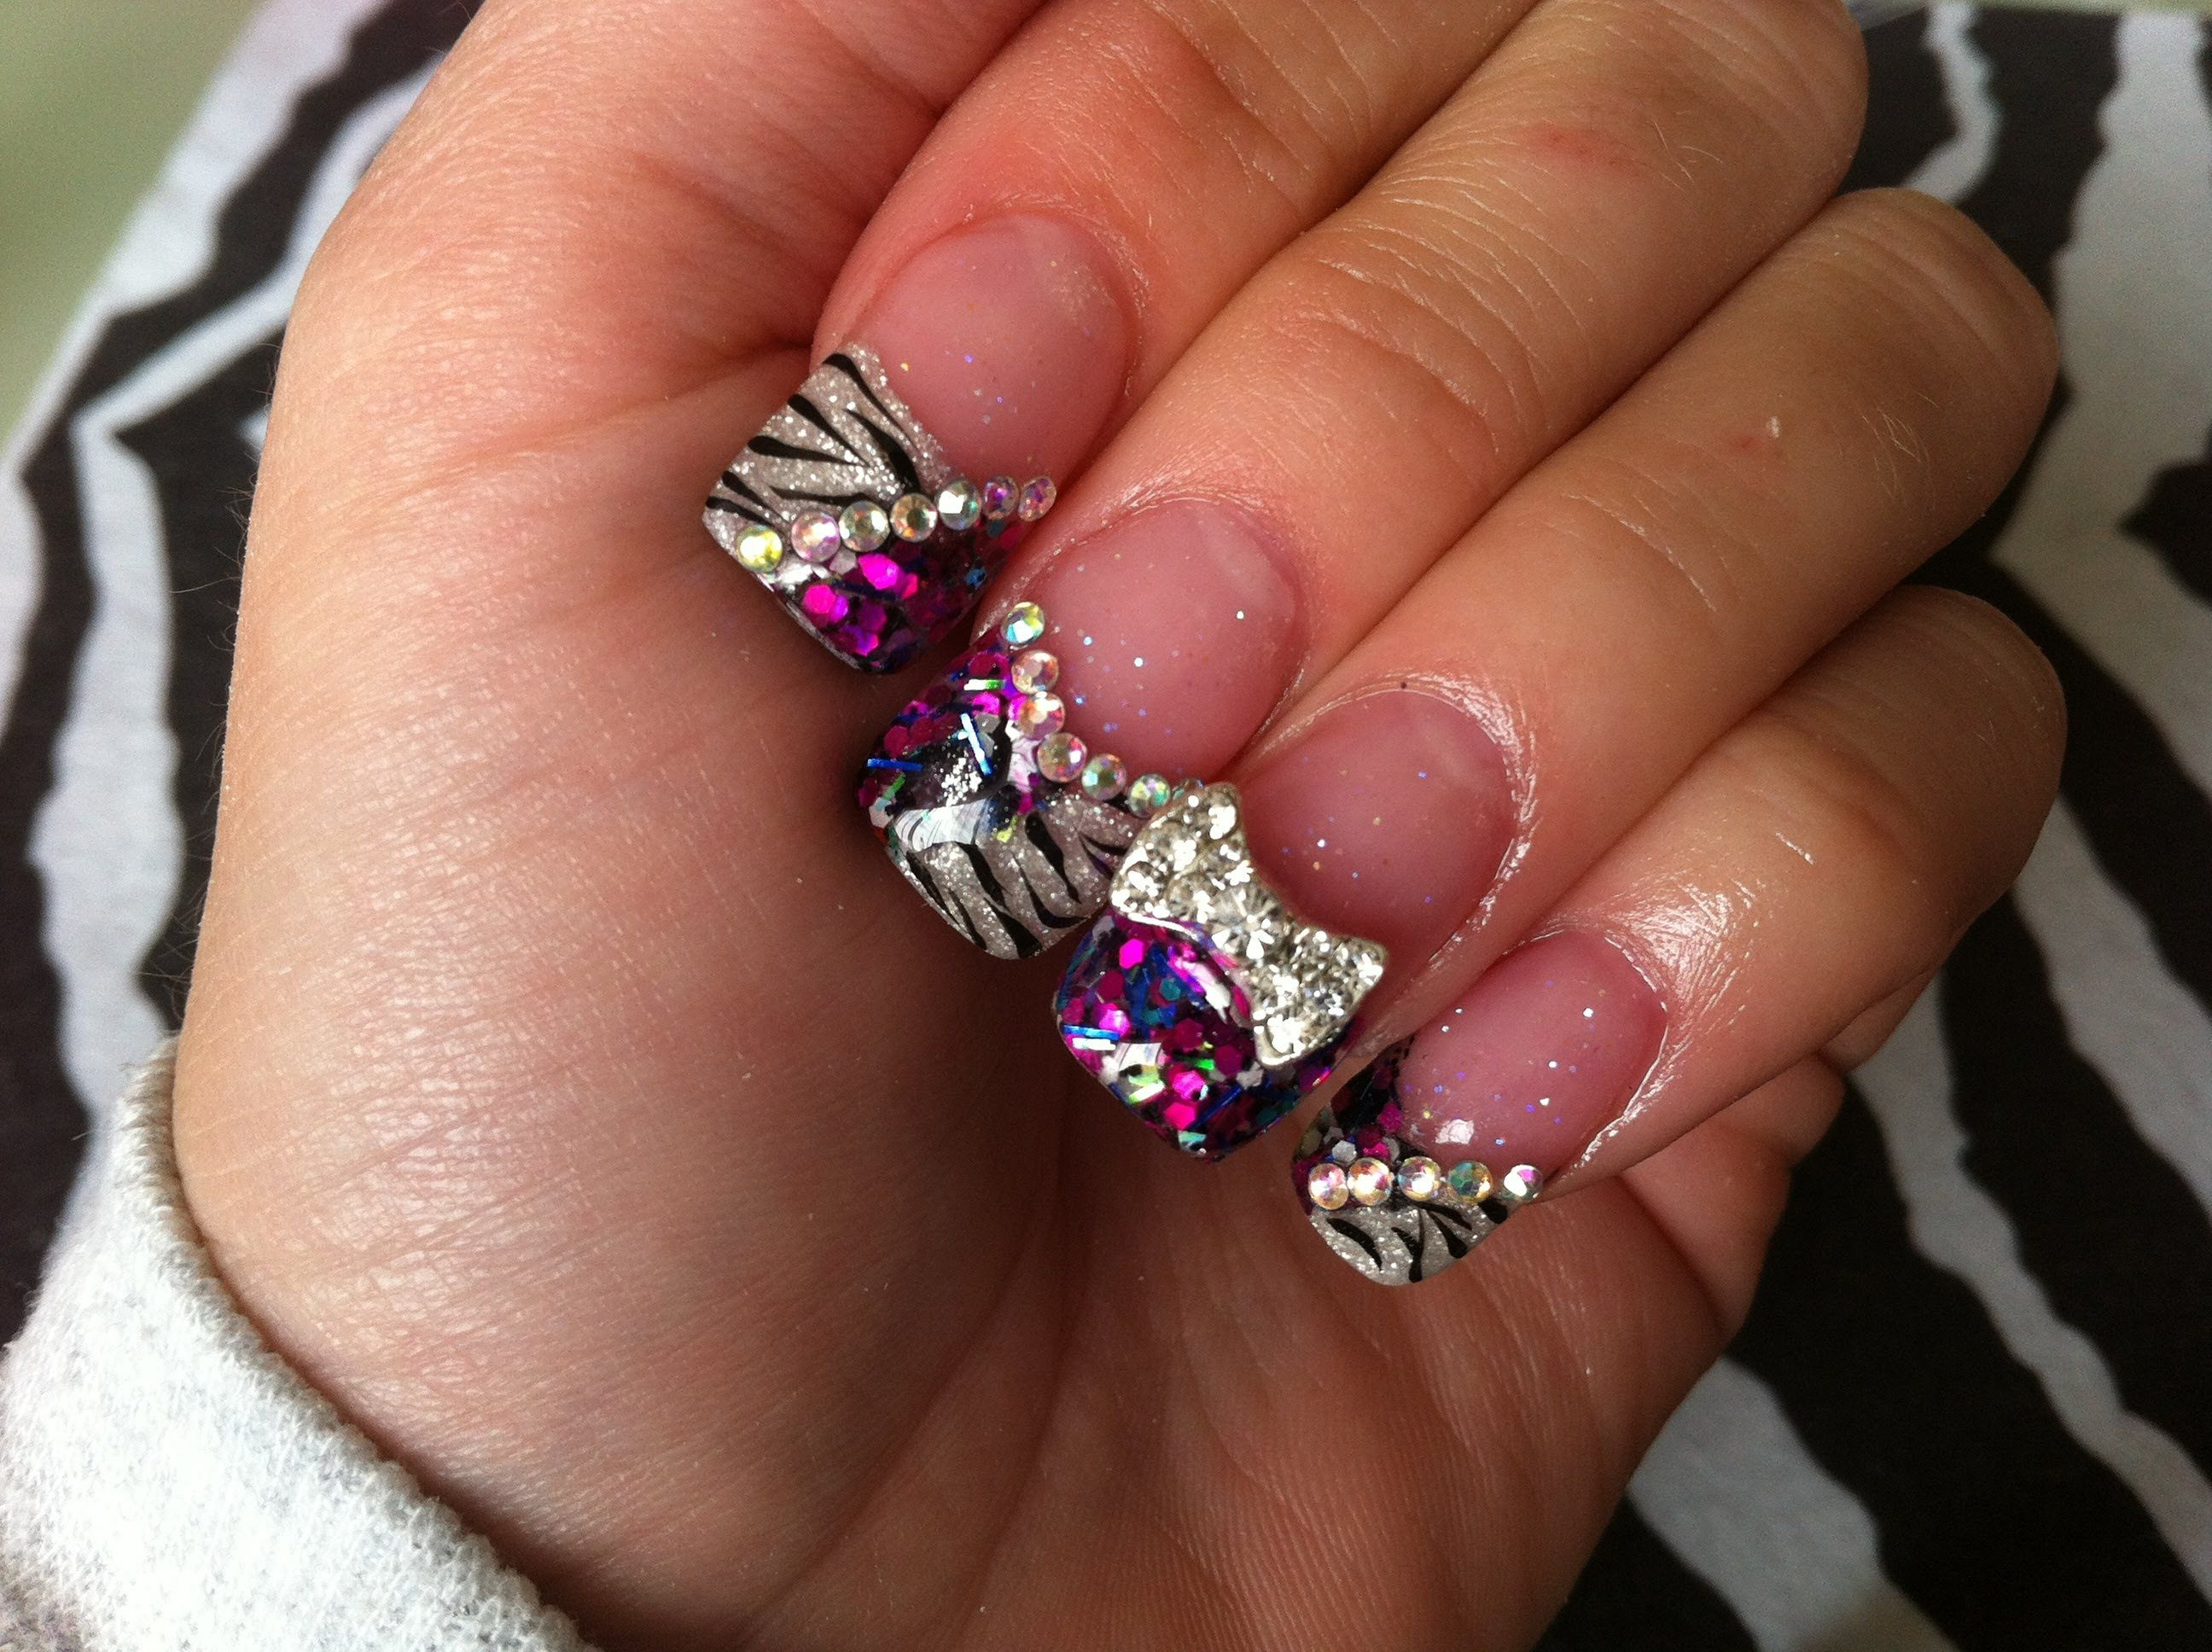 Acrylic Nails - Zebra Bling | ♥☆Acrylic Nail Ideas☆♥ | Pinterest ...